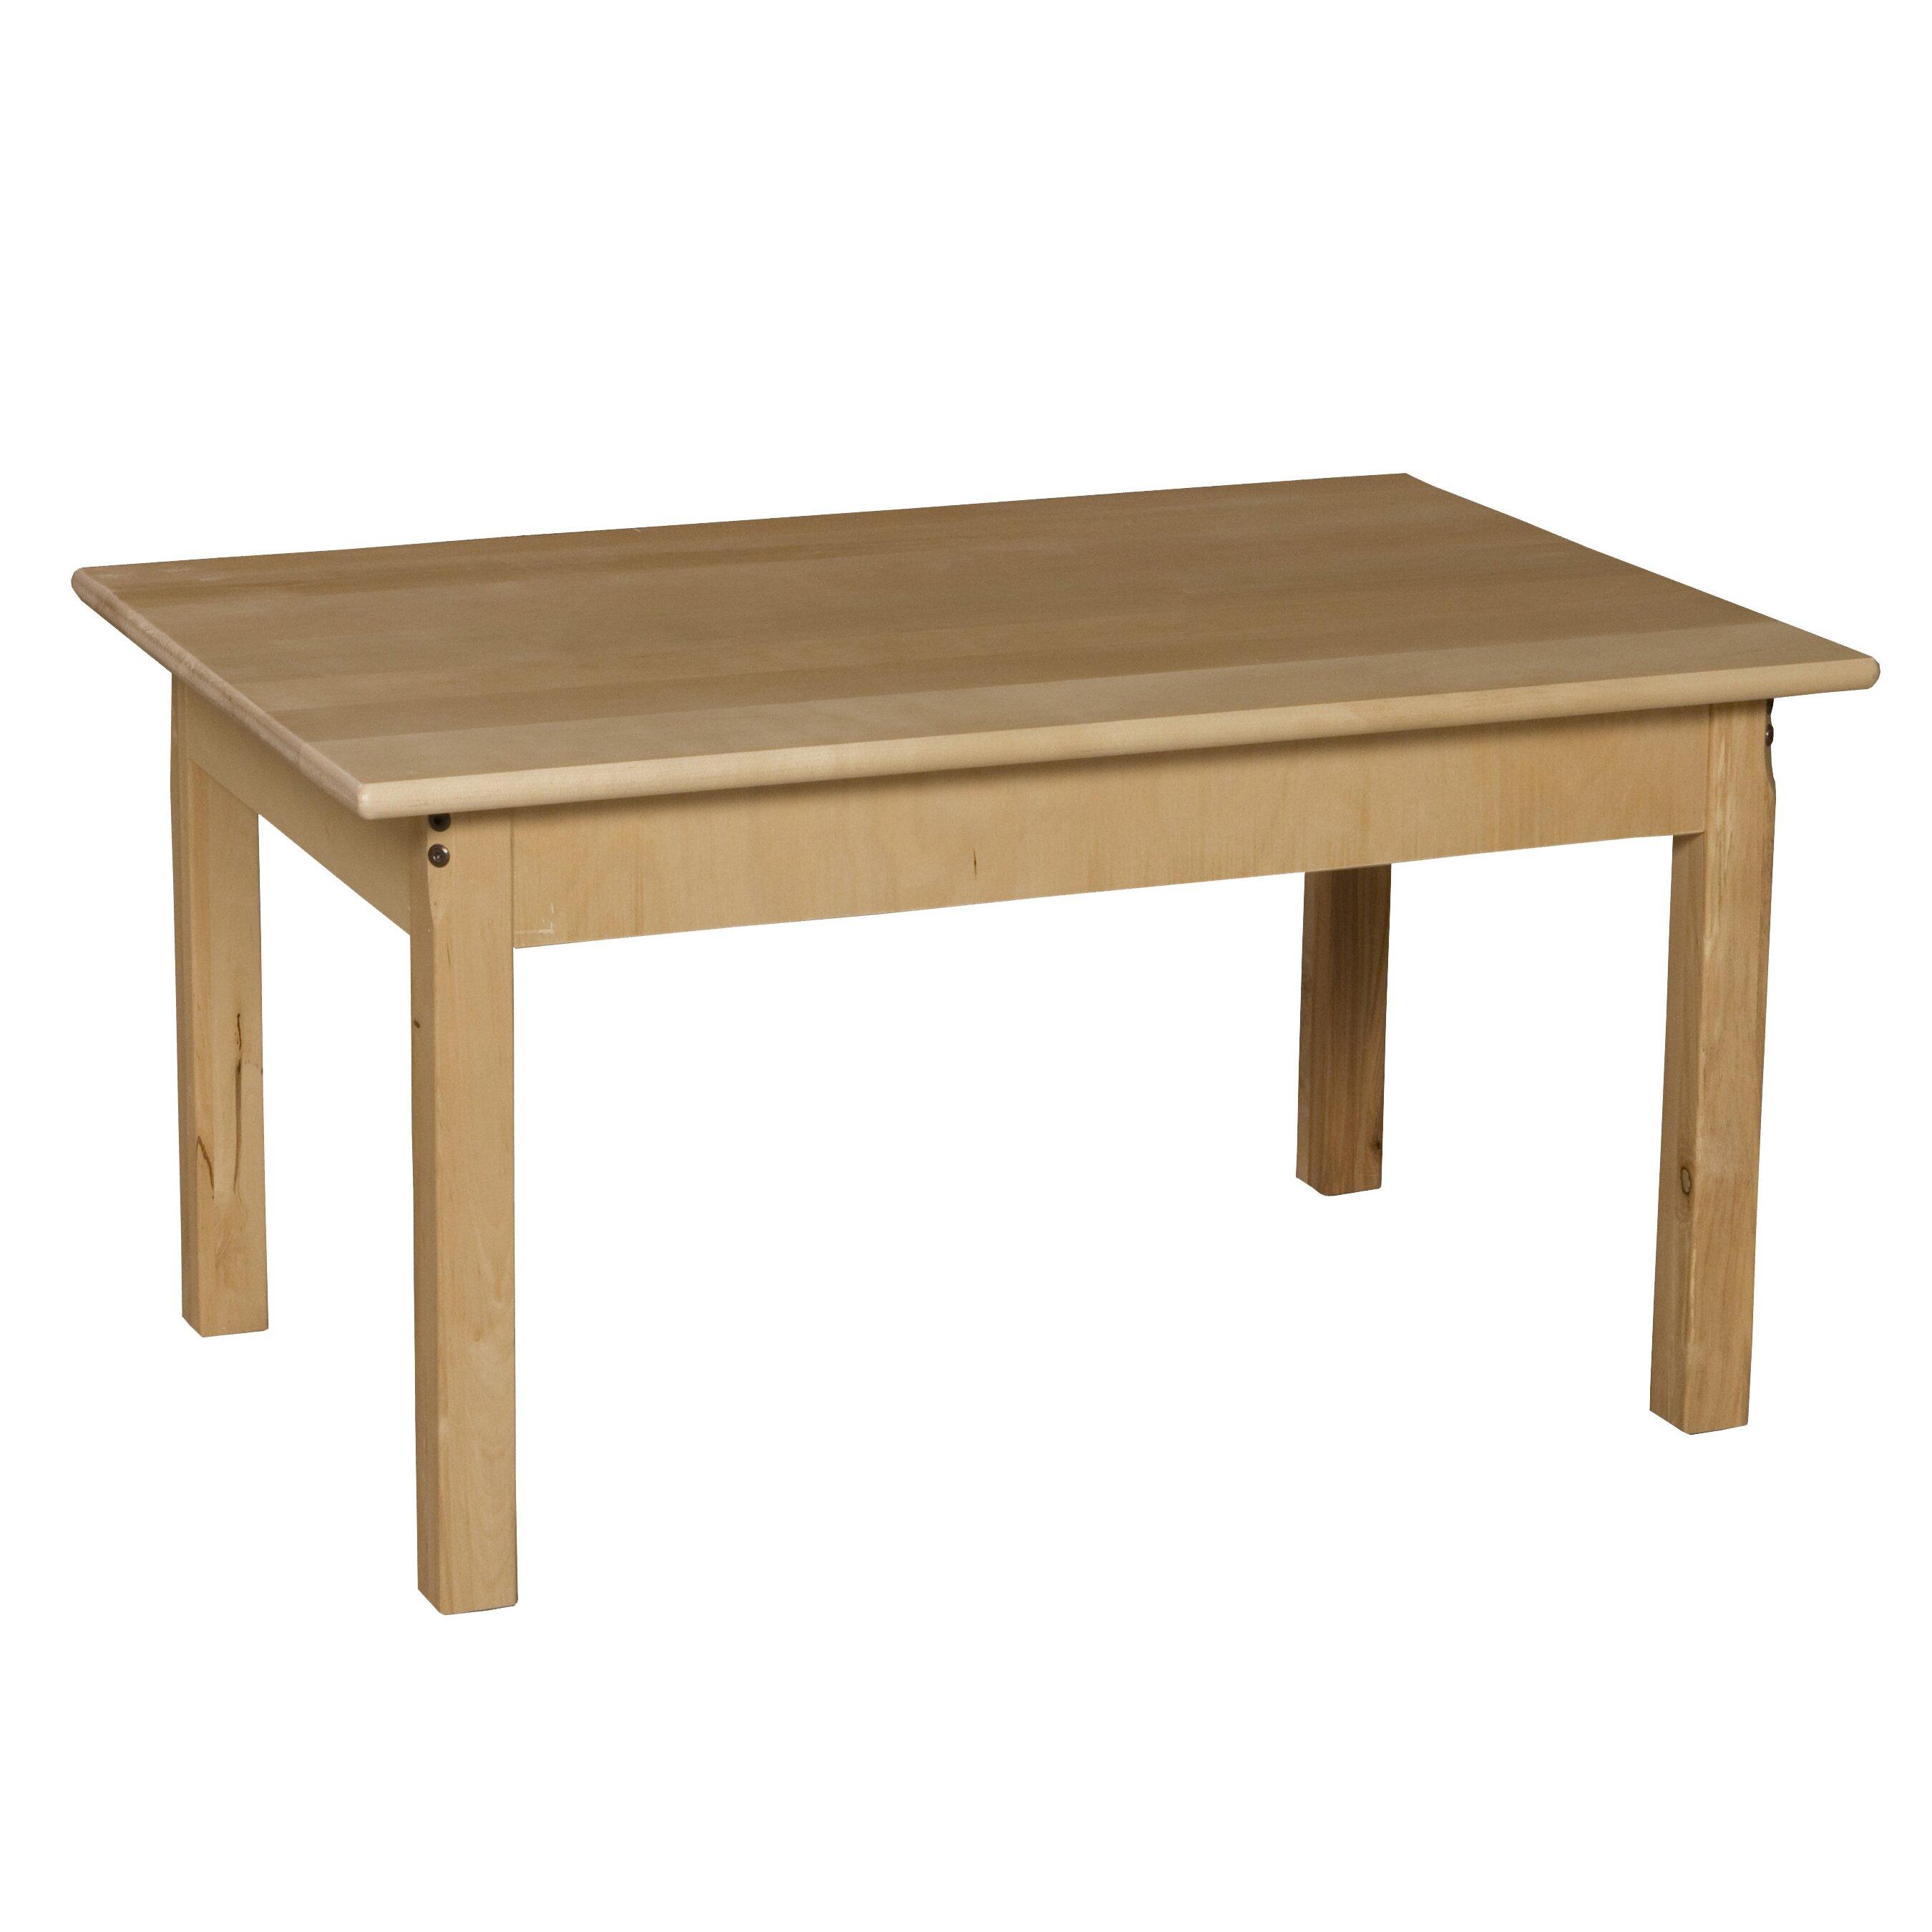 Wood designs 36 quot x 24 quot rectangular activity table amp reviews wayfair